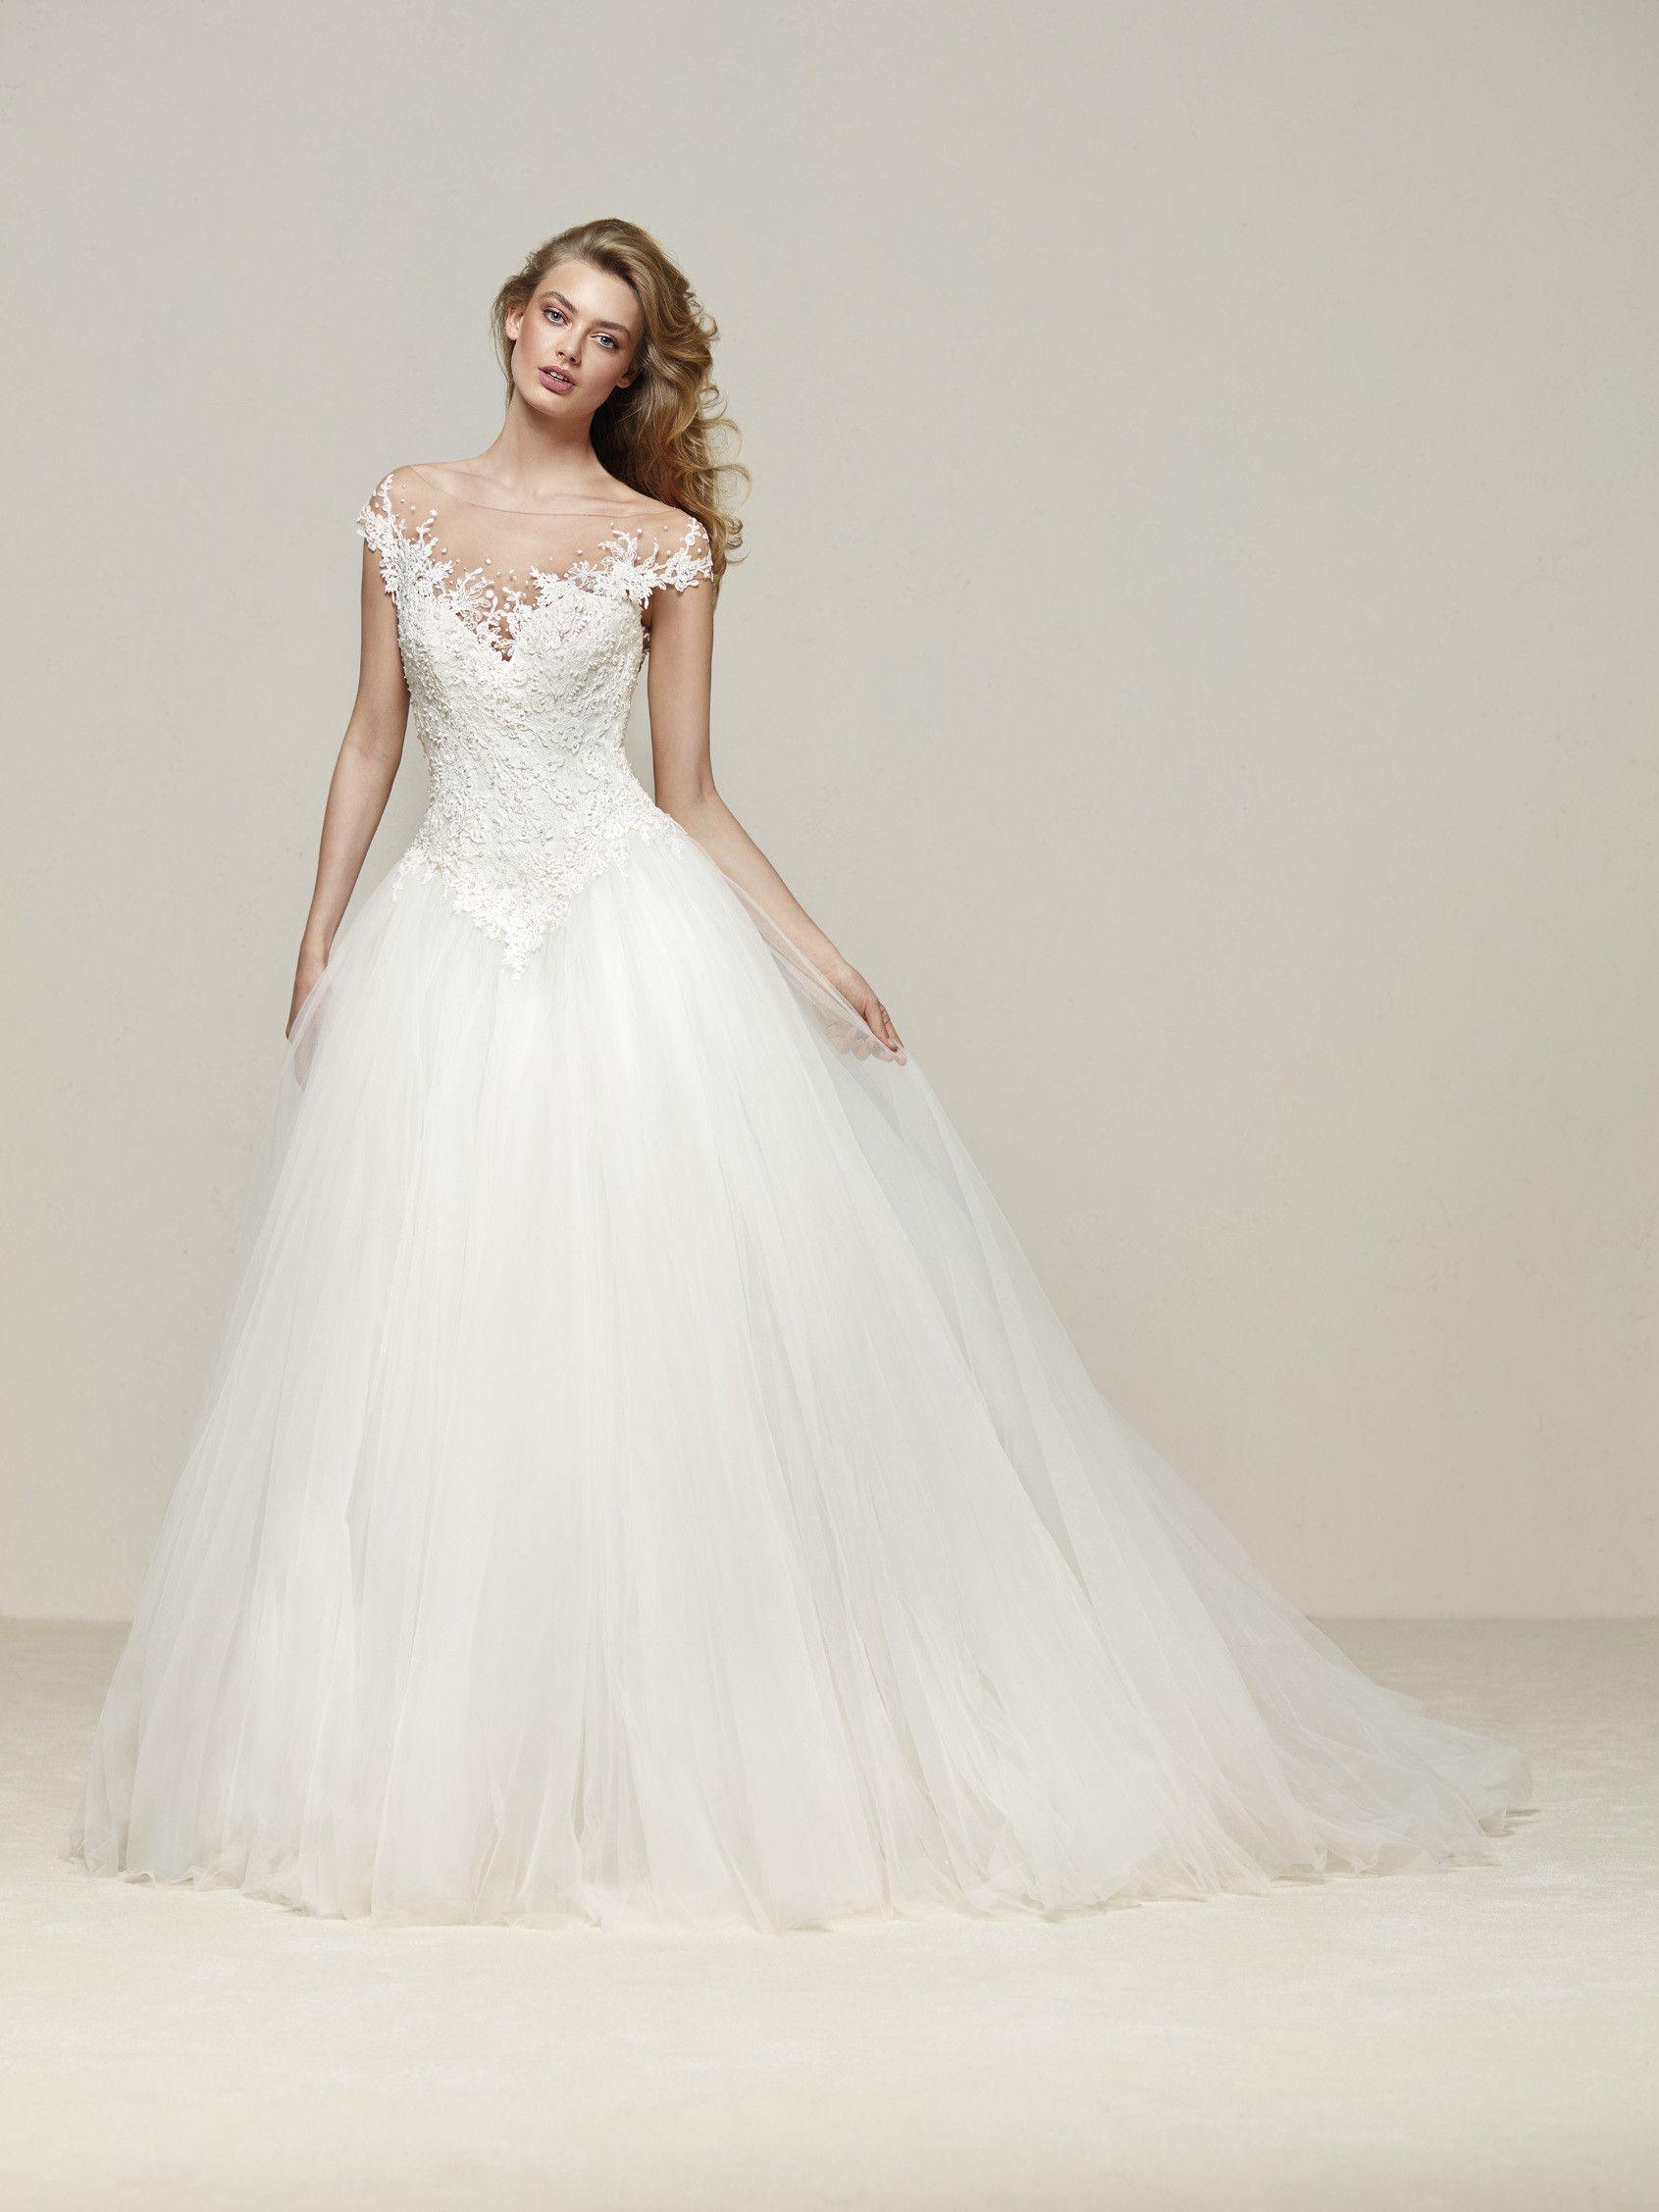 Sheer top wedding dress  Brautkleid Prinzessin Drosel  Wedding  Pinterest  Princess